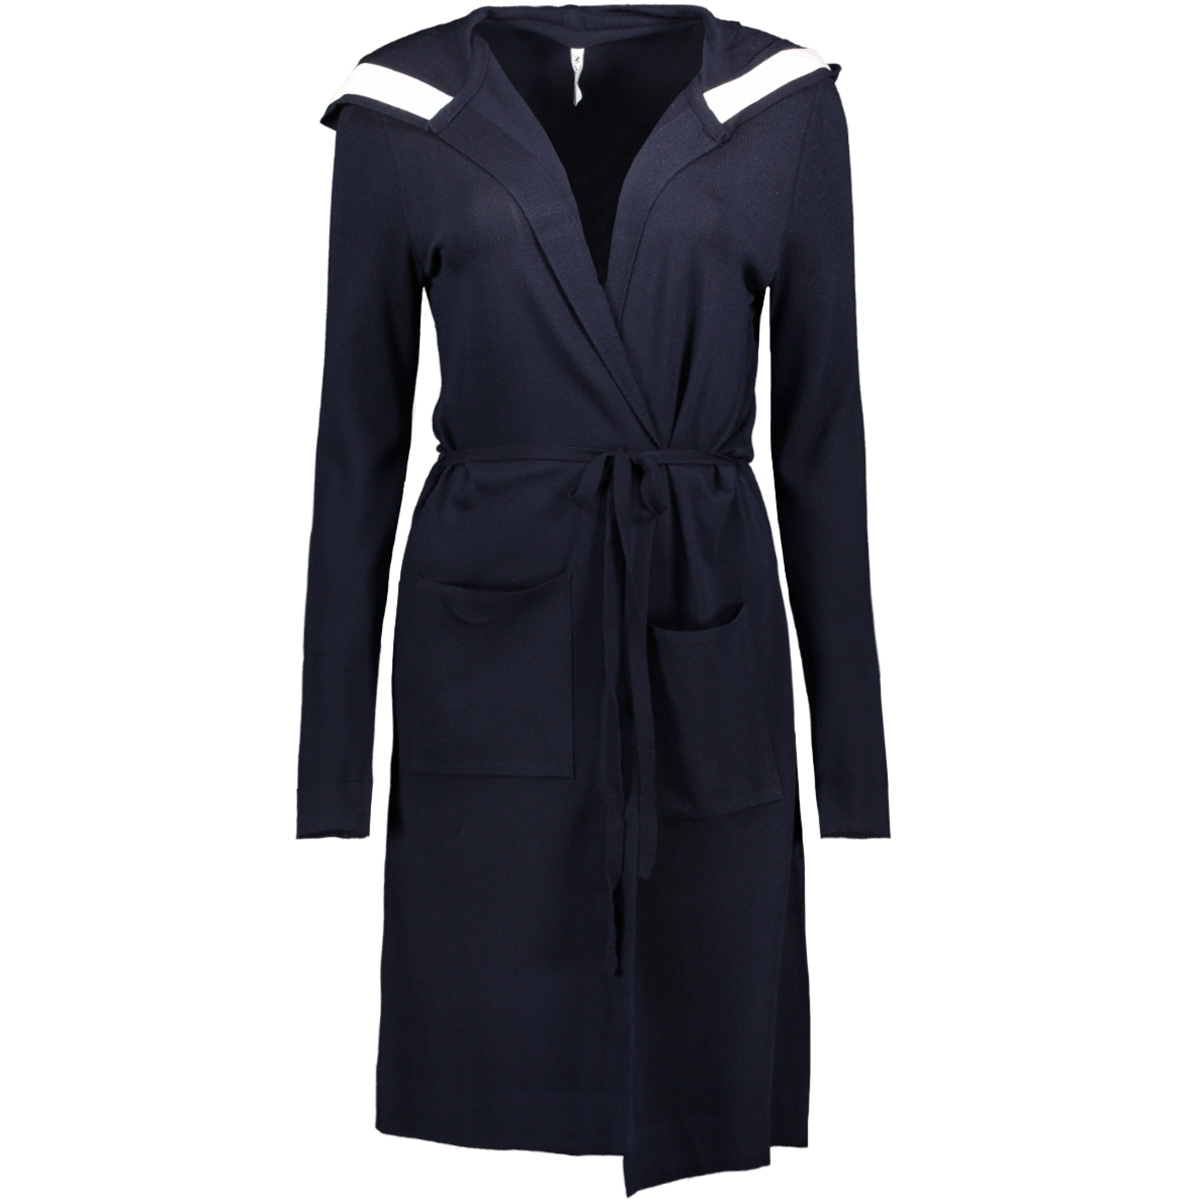 kn1905 cardigan long zoso vest navy/off white